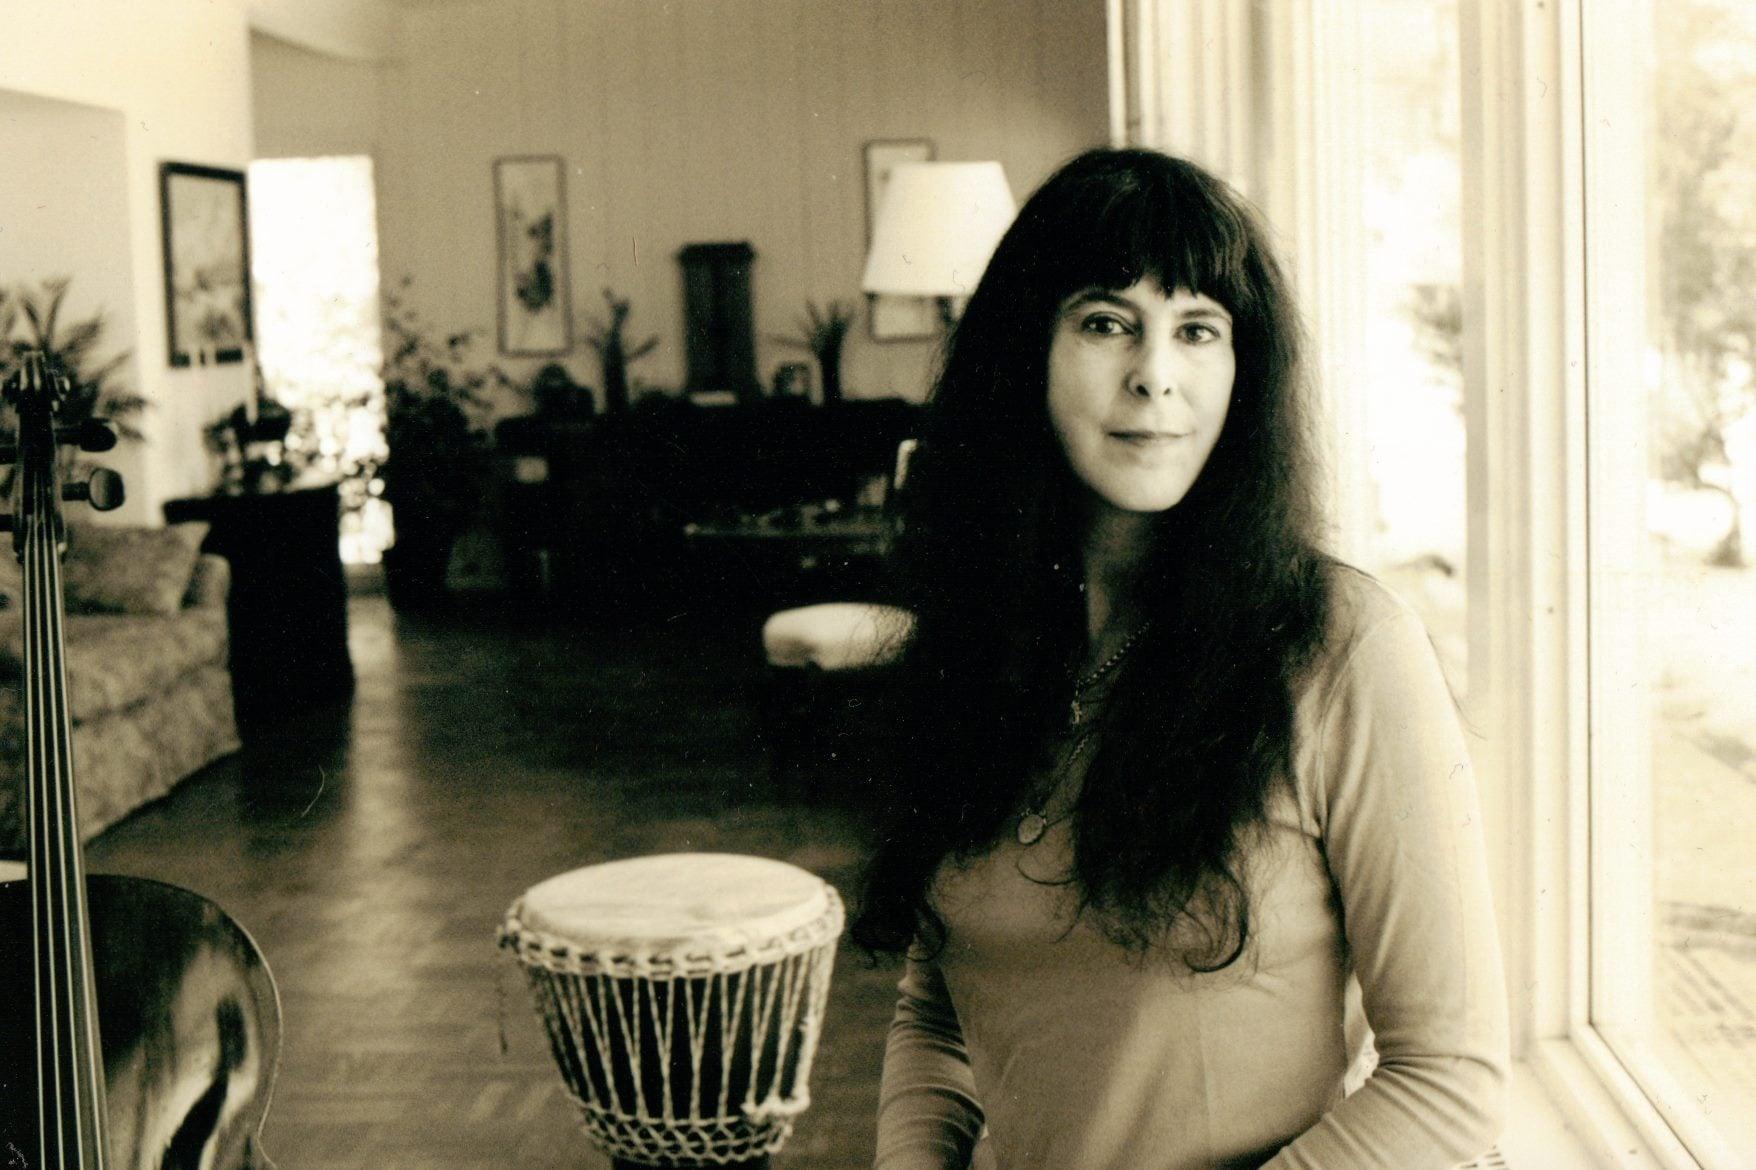 Sudden death of vivid US composer, 73